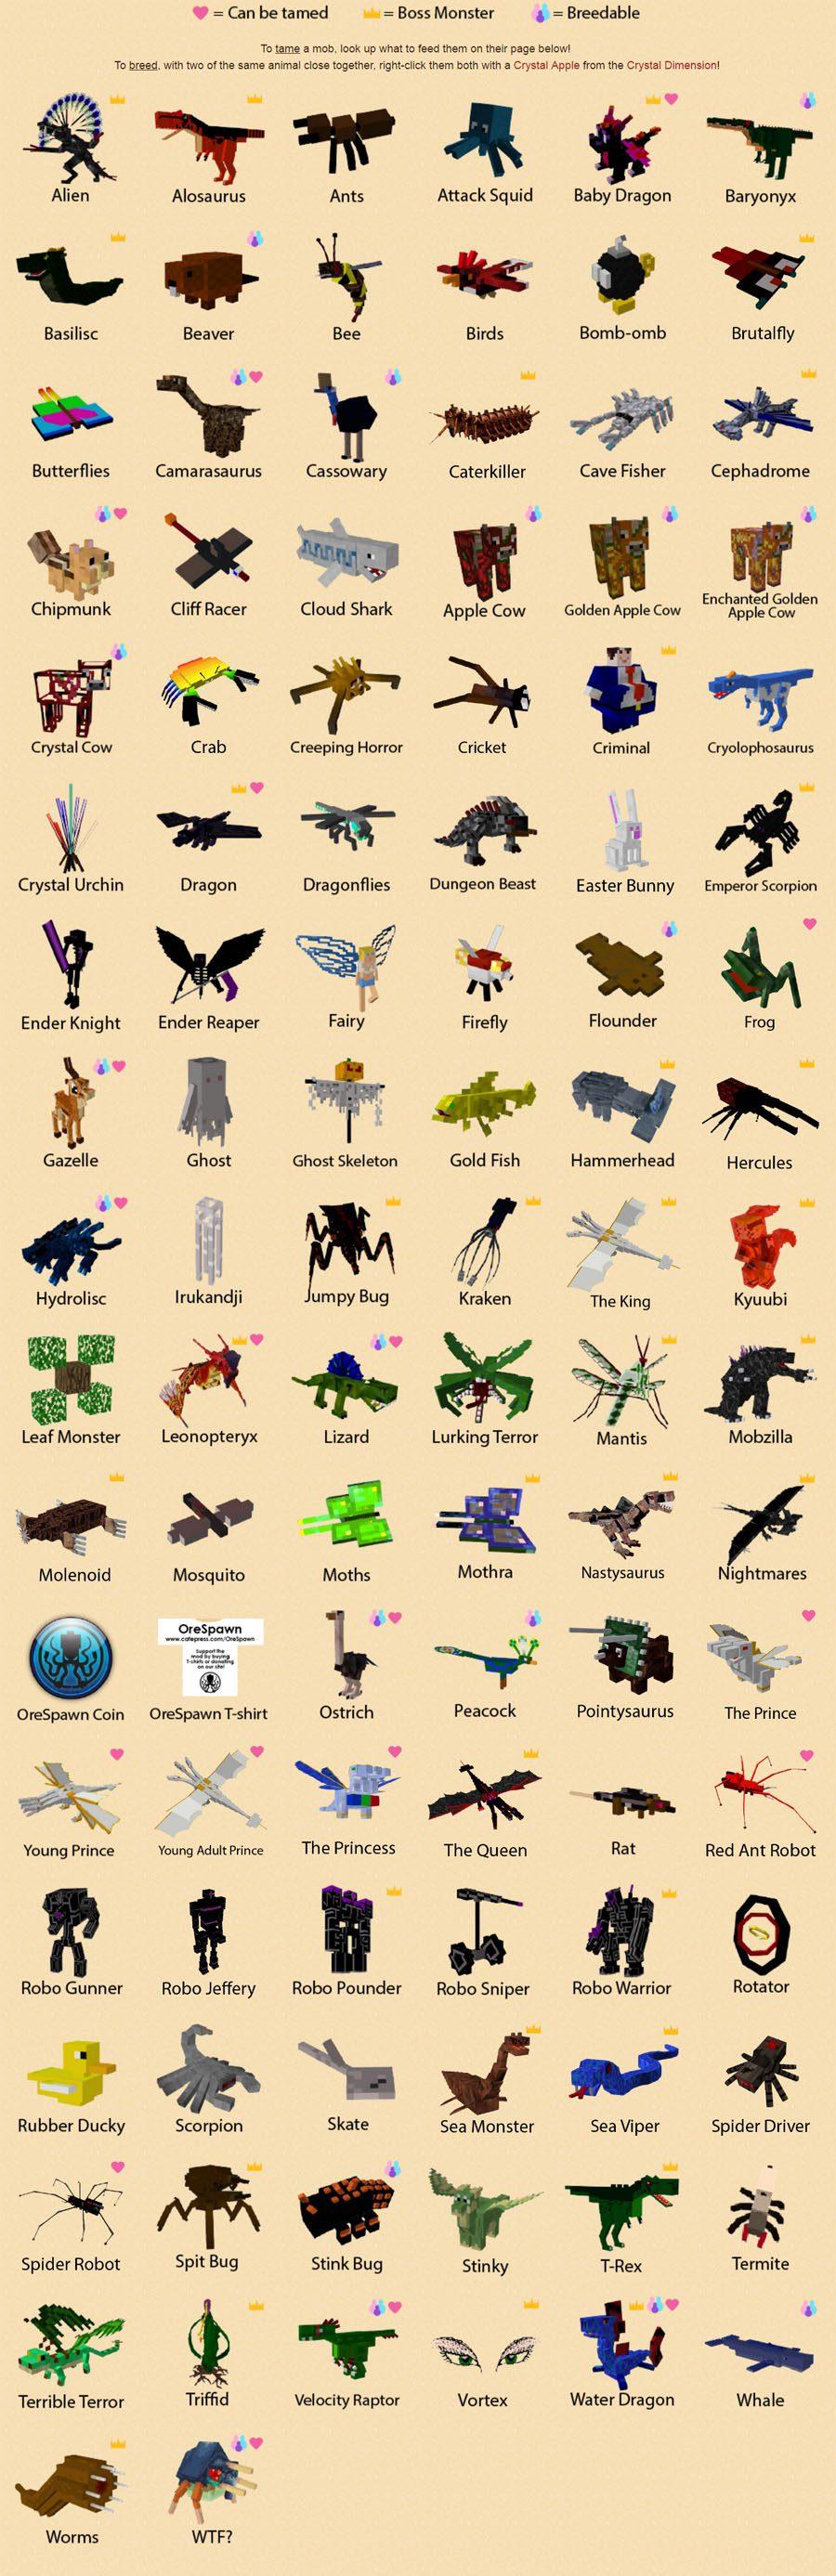 OreSpawn Mod Creatures